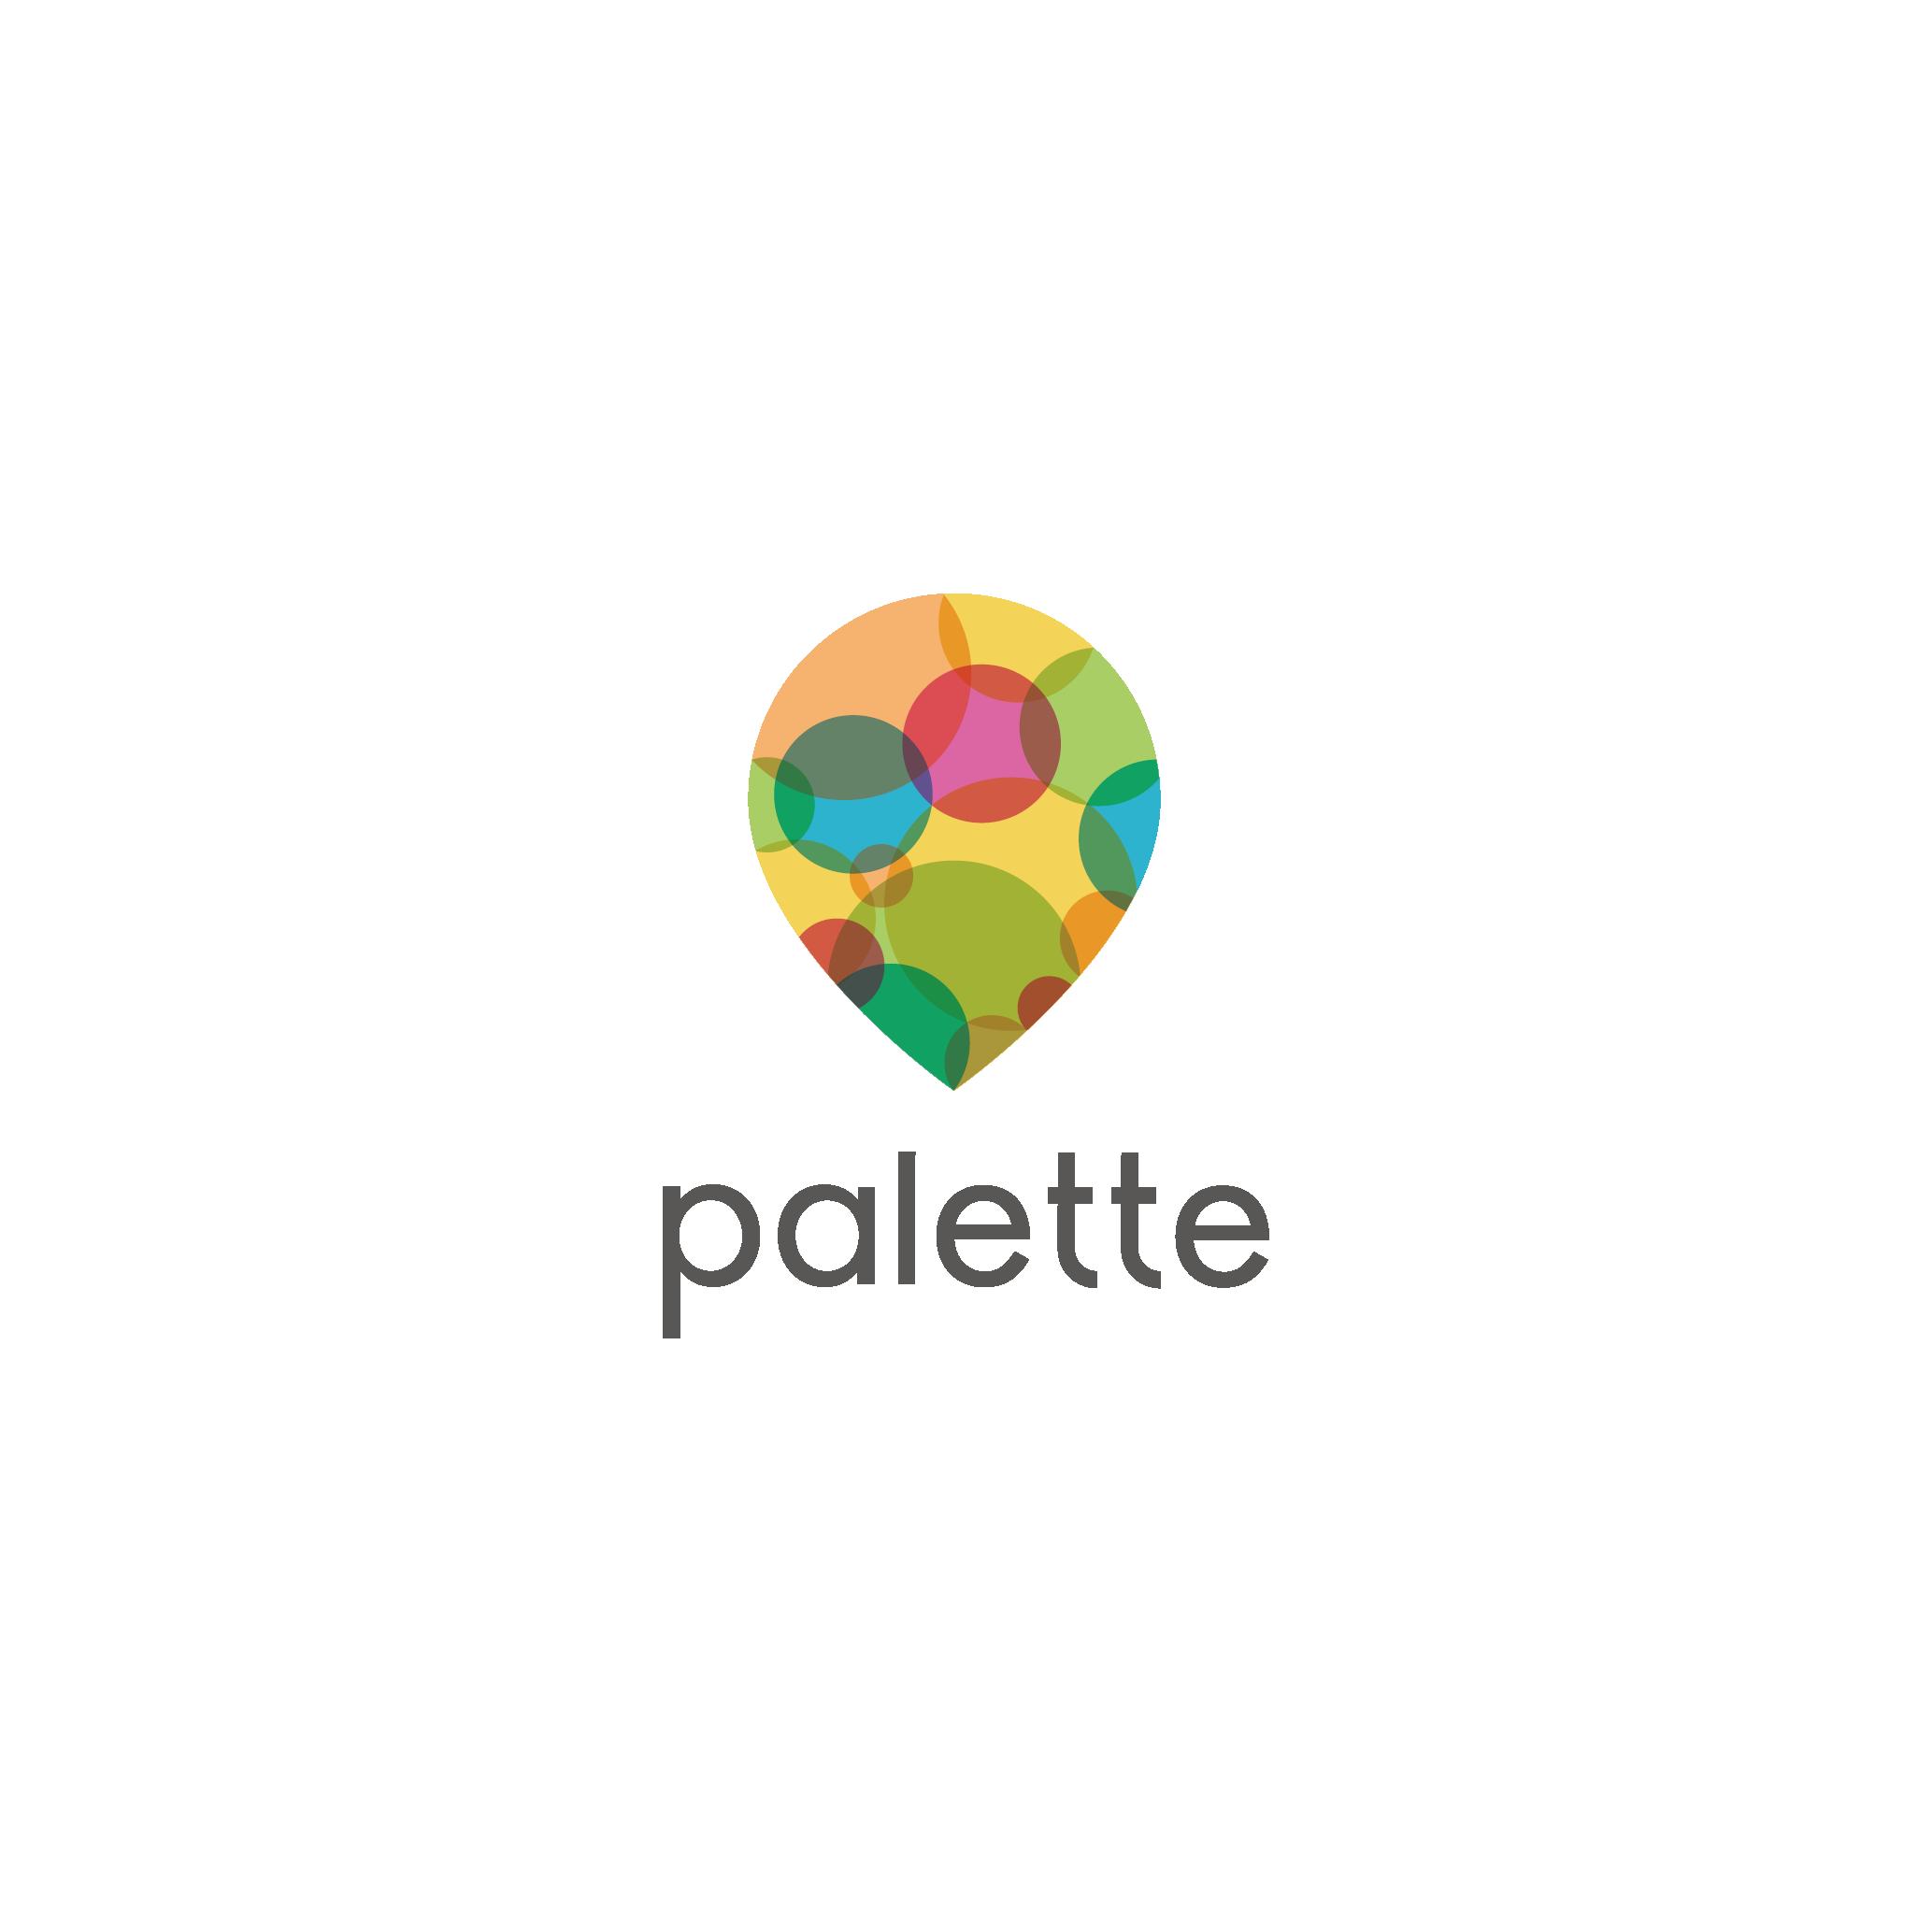 palette様